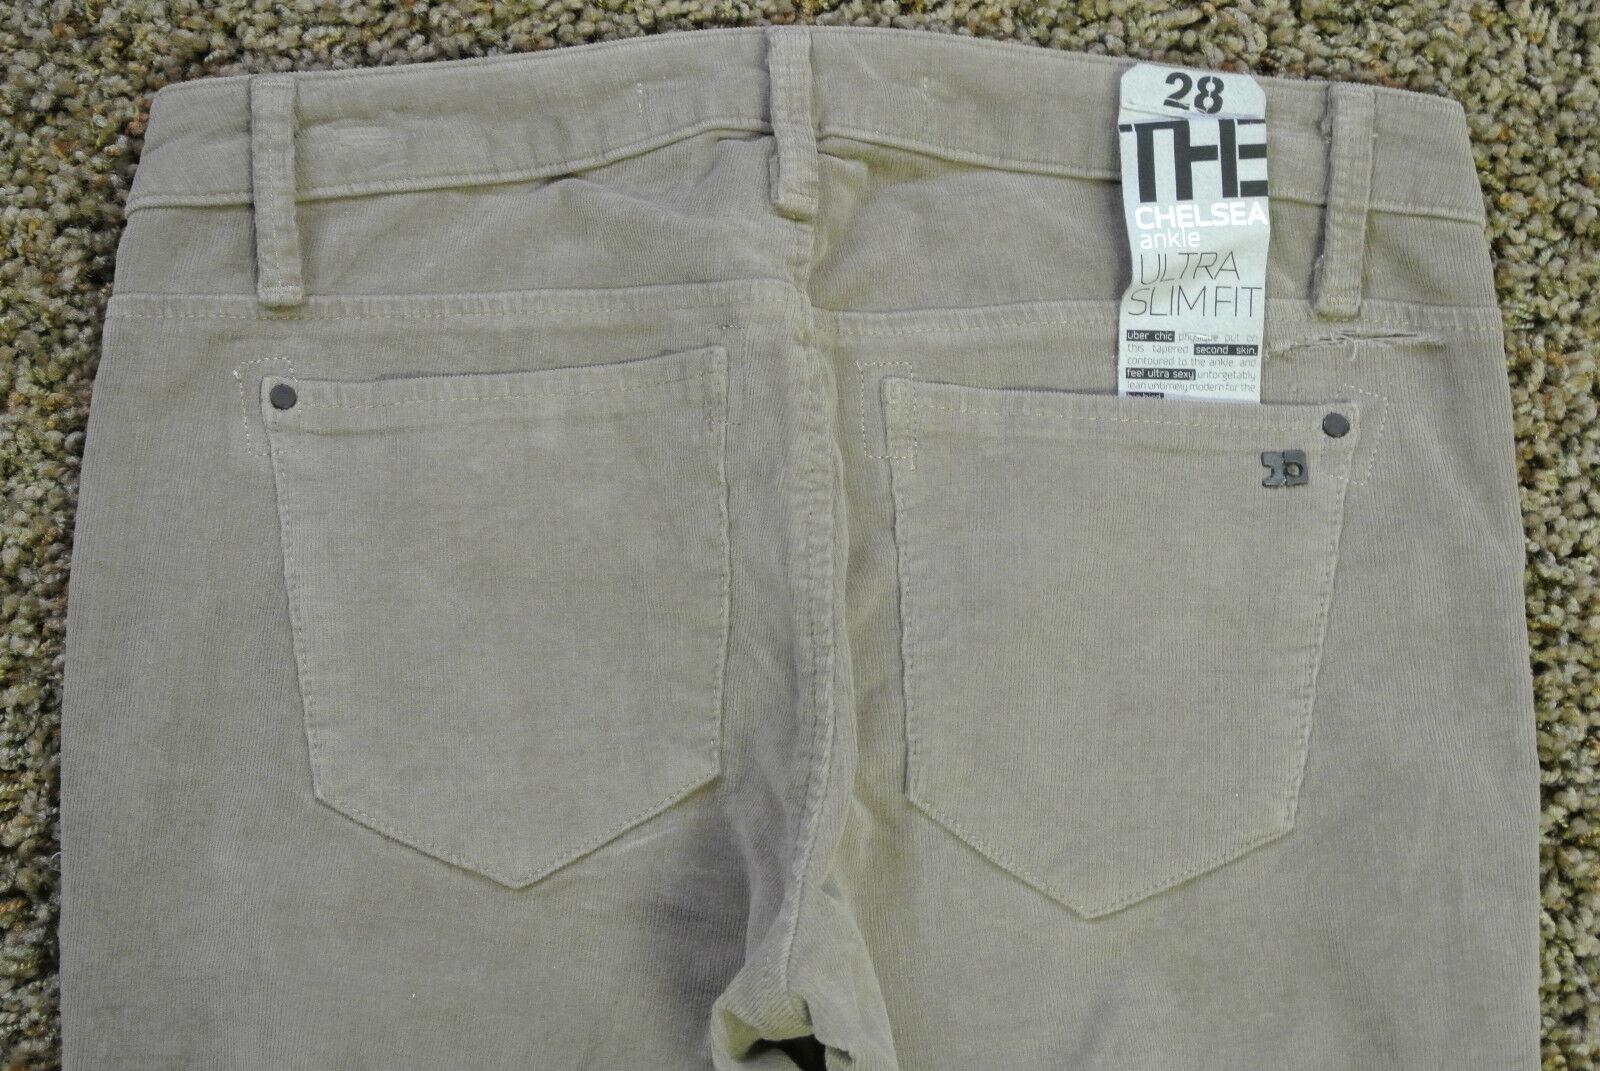 JOE'S CHELSEA Ankle Corduroy JEANS 28X29 NWT Sexy Ultra Slim Fit Walnut Wash